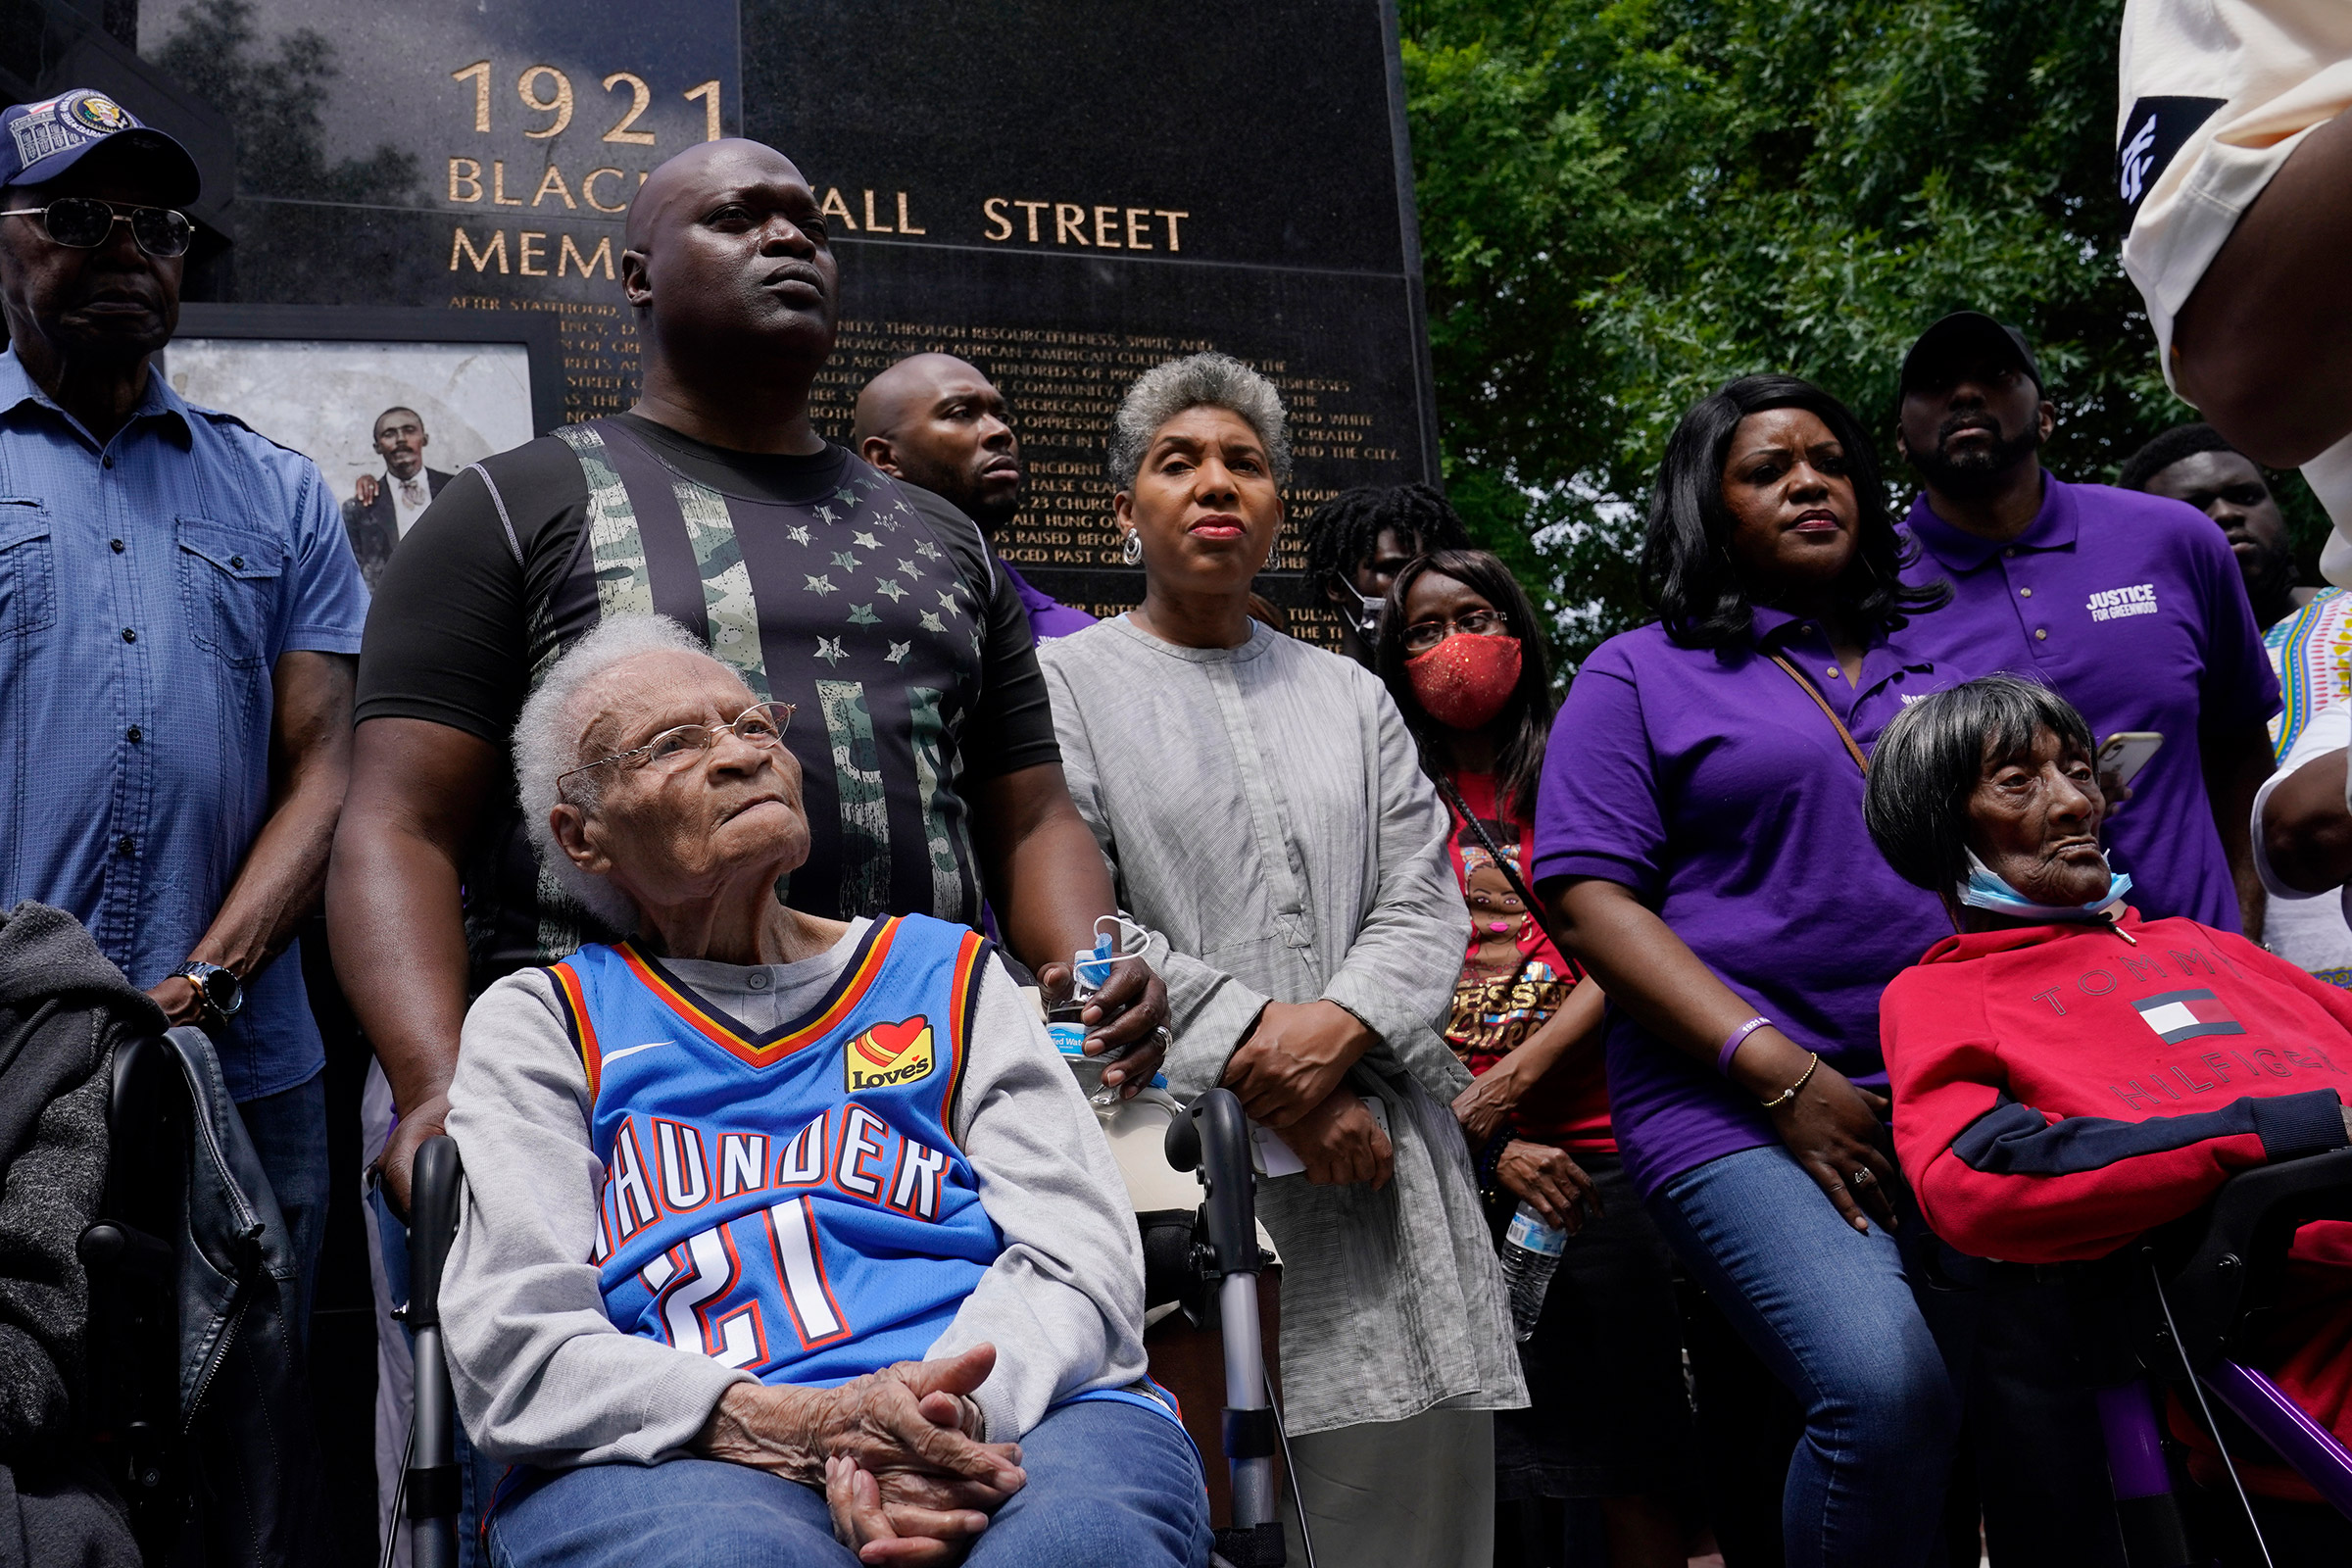 Tulsa Race Massacre survivors Viola Fletcher, left, and Lessie Benningfield Randle, right, listen during a rally marking centennial commemorations in Tulsa, Okla., on May 28, 2021.